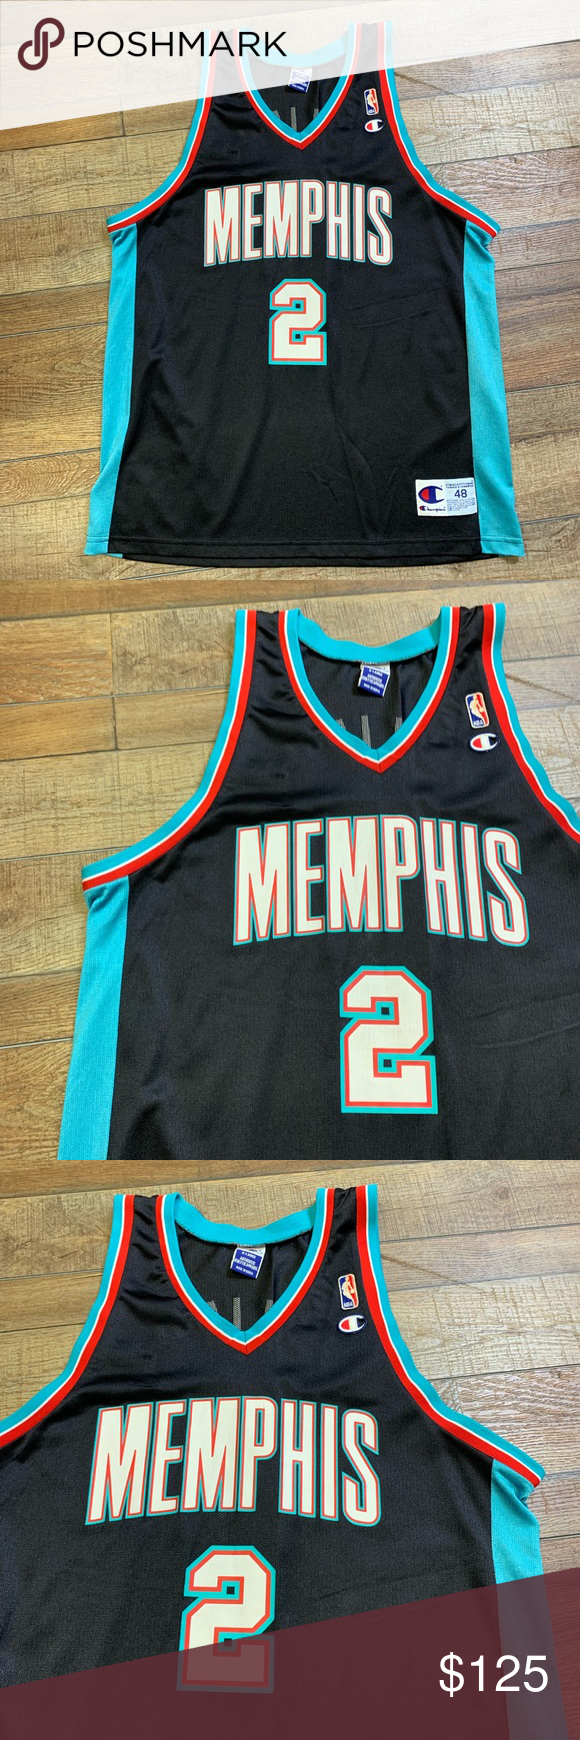 save off 7a7fd 5fb8c Jason Williams Vancouver Grizzlies NBA Jersey 48 Excellent ...